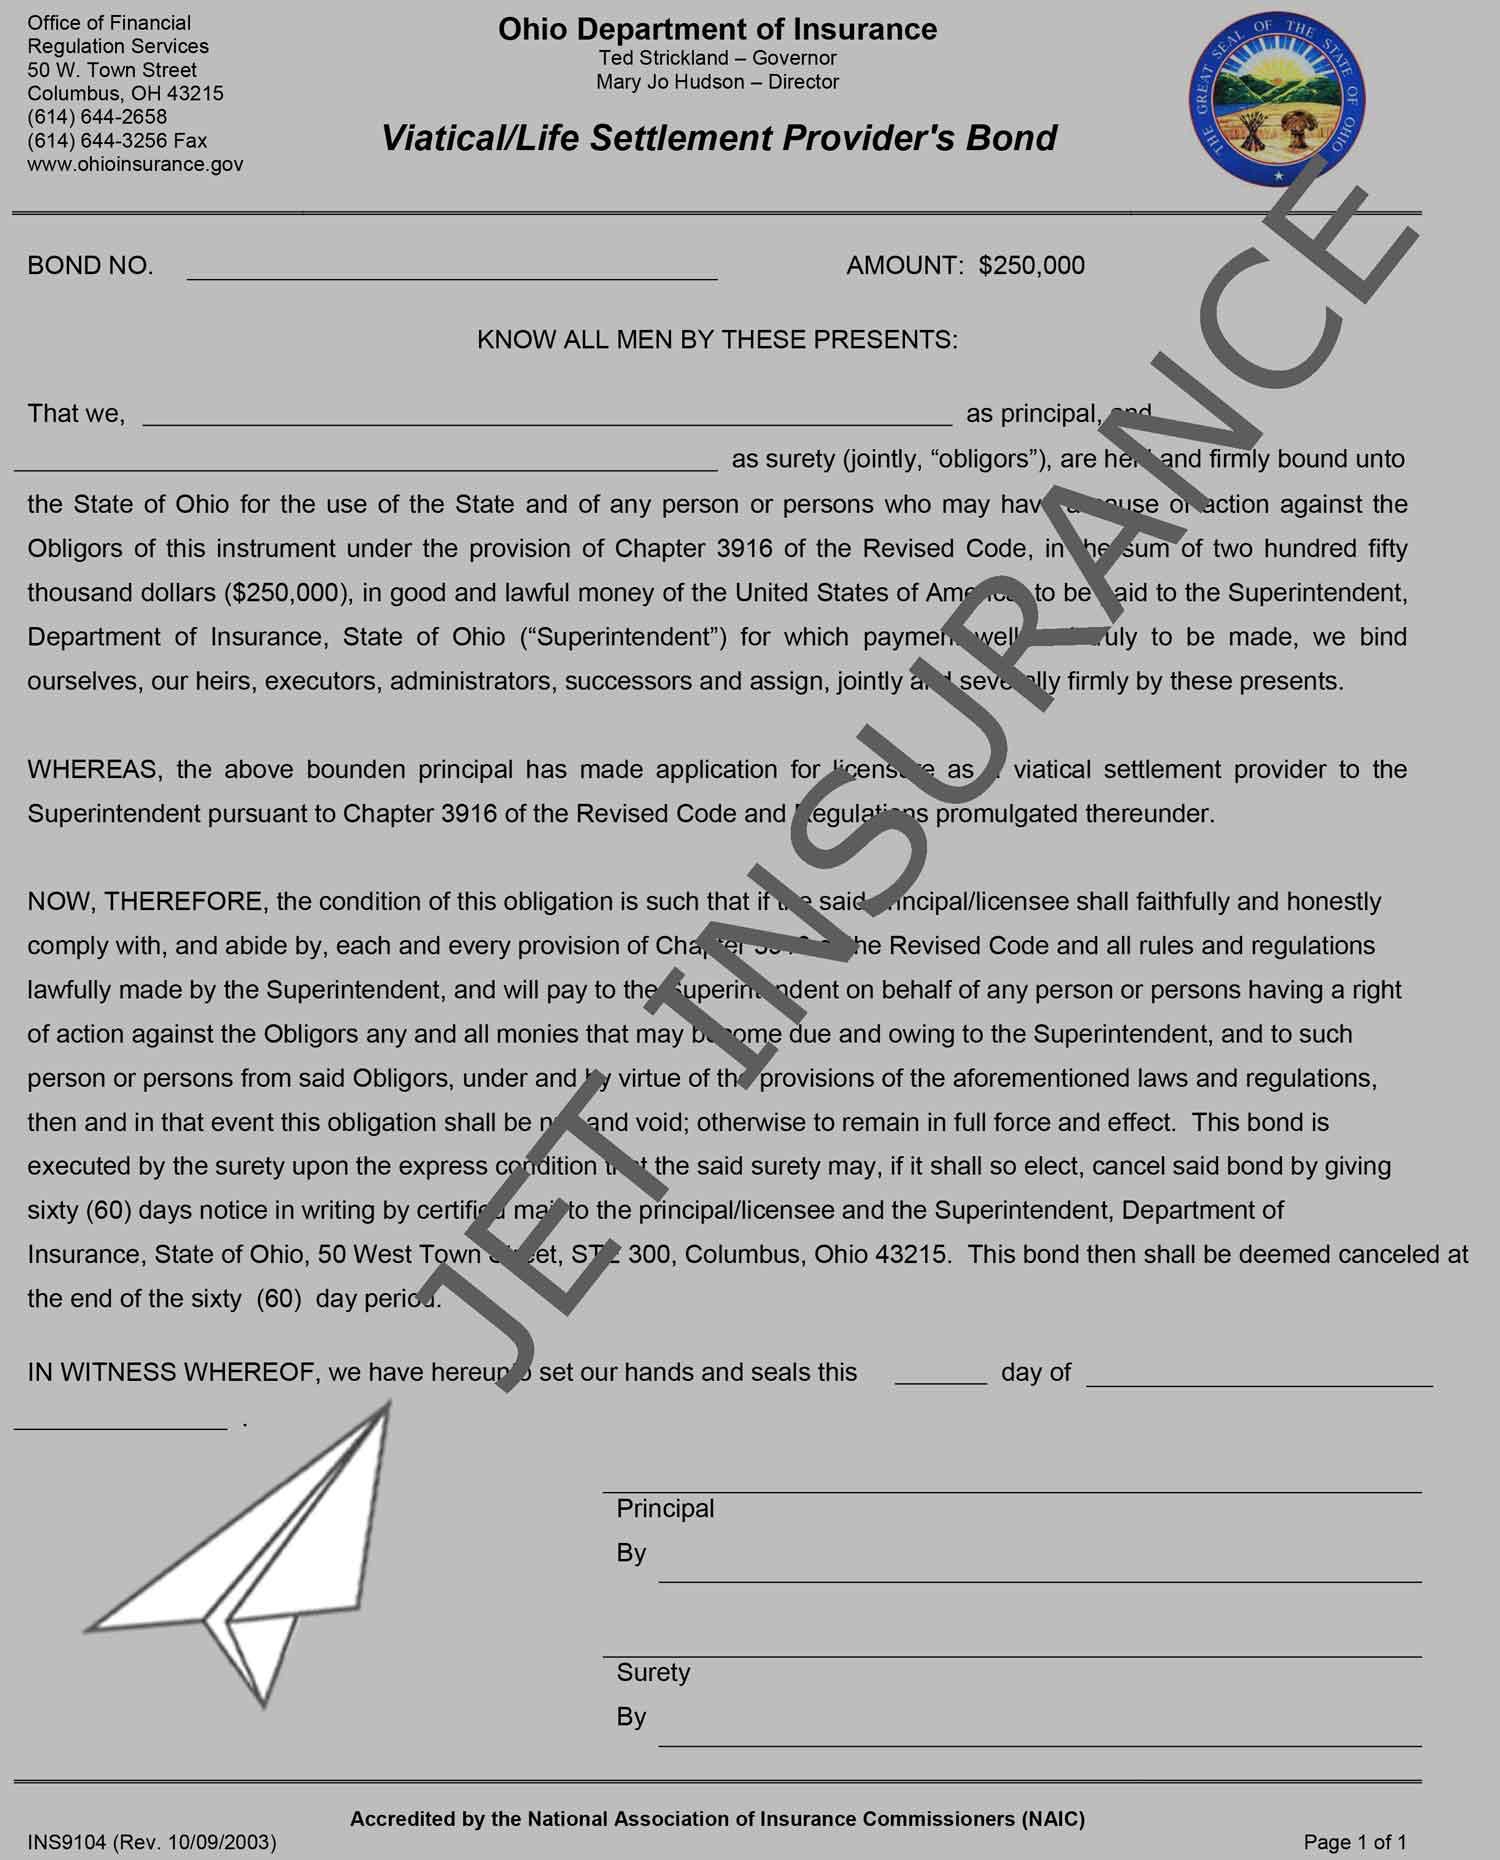 Ohio Viatical/Life Settlement Provider Bond Form